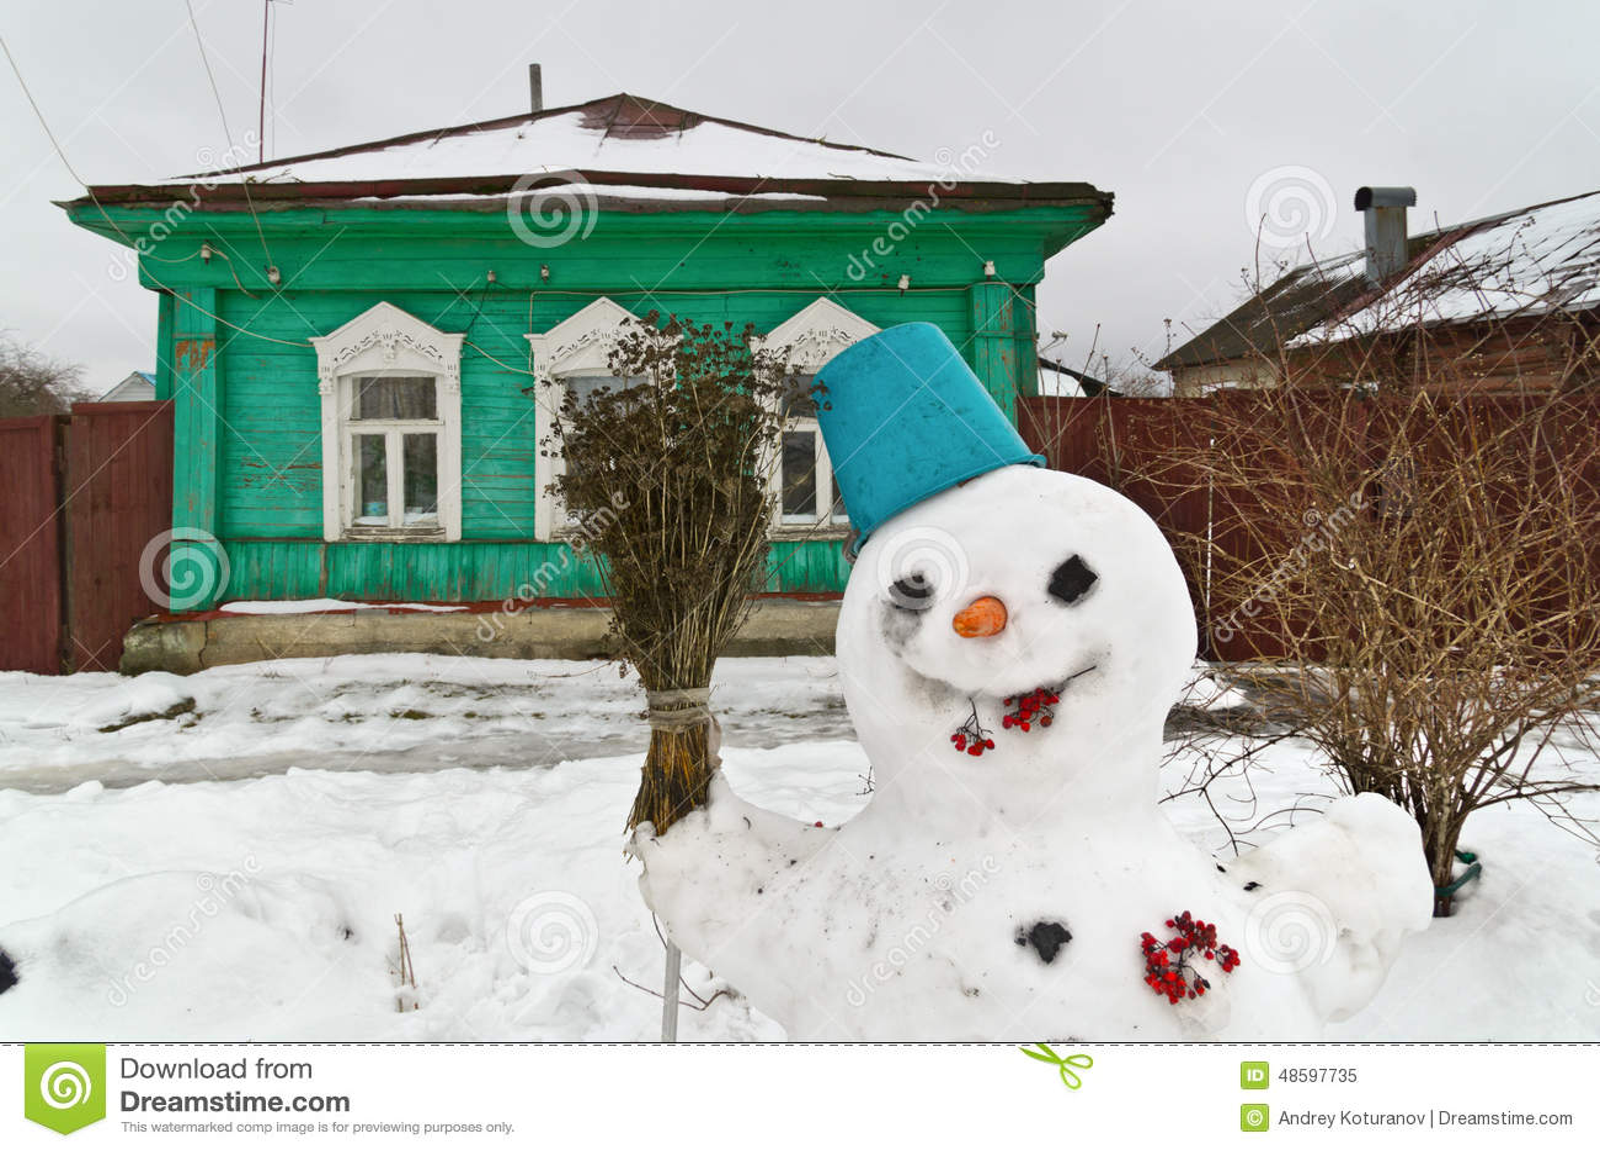 Russian province